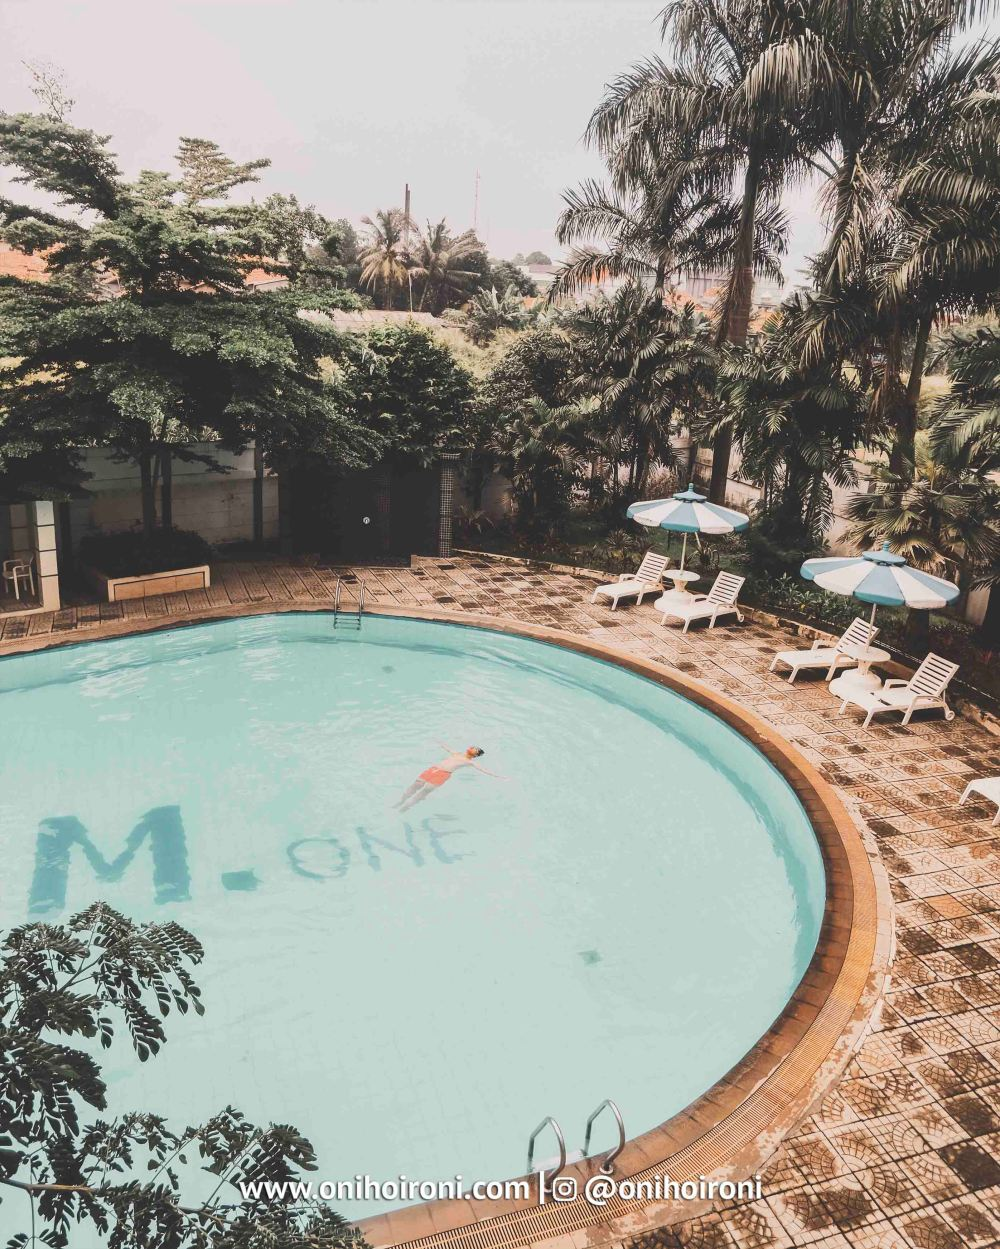 Swimming Pool M One Hotel Sentul Bogor, Onihoironi